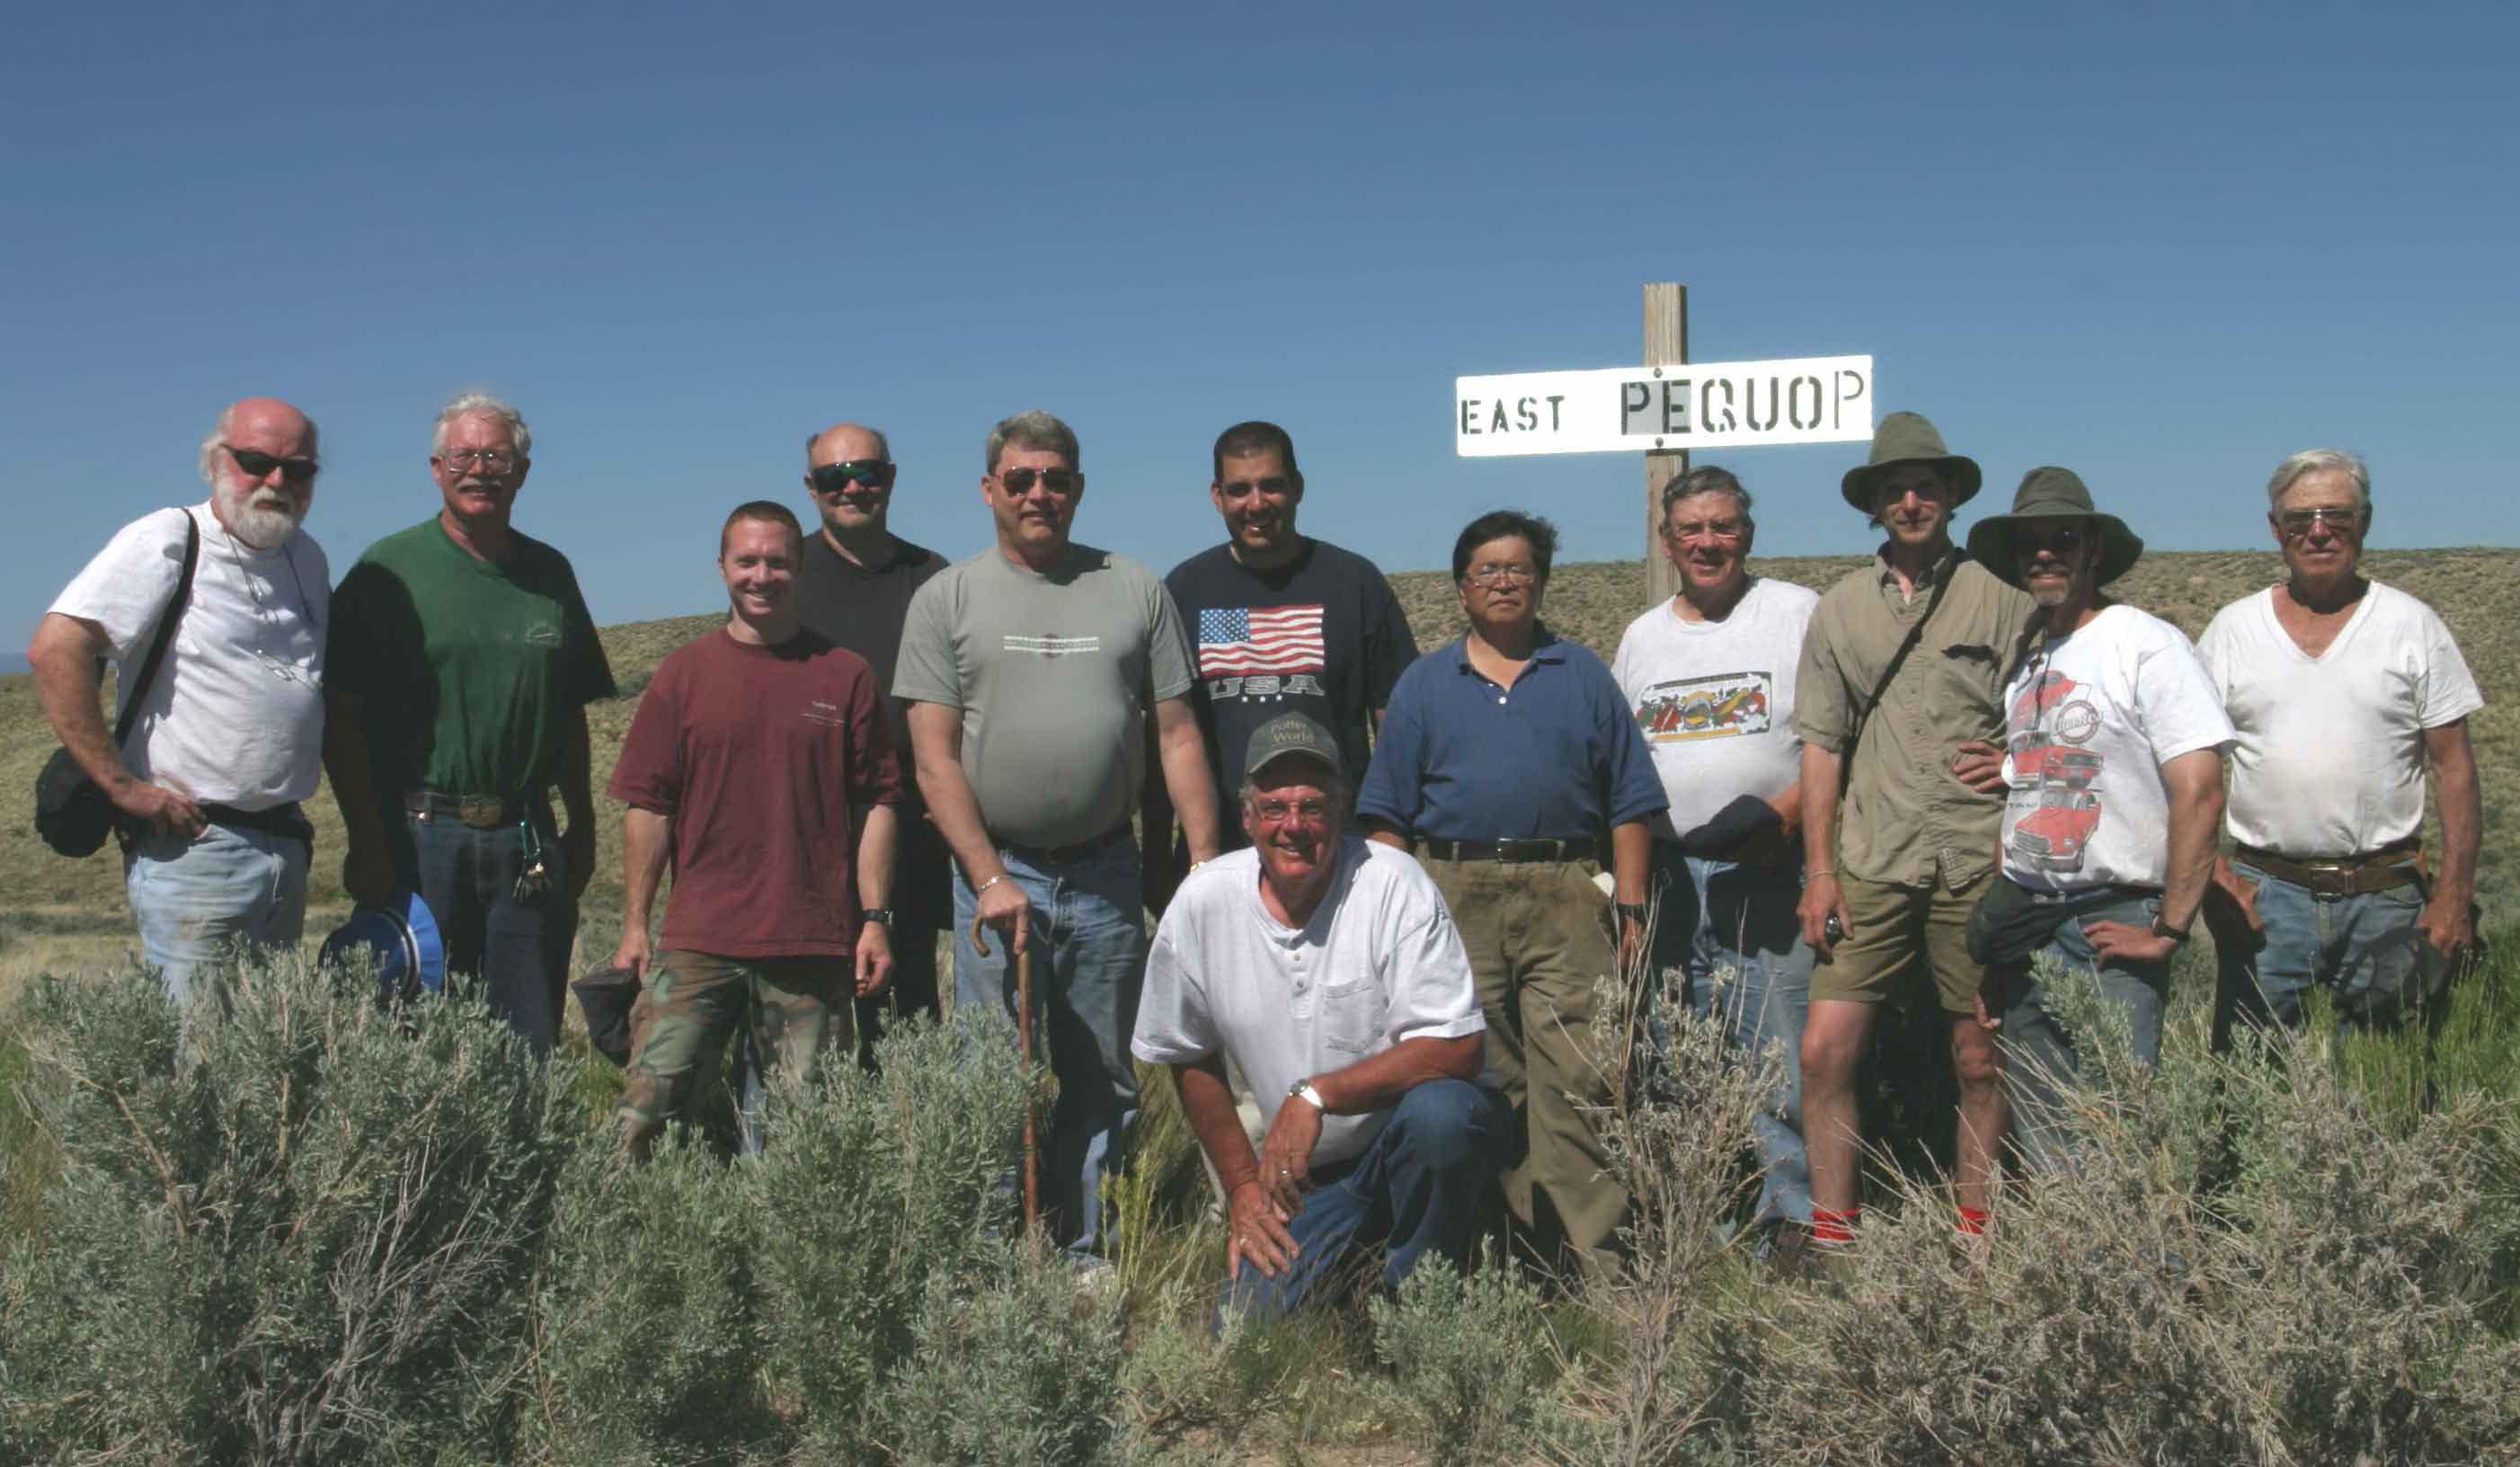 Twelve guys in the Nevada desert, June, 2006.